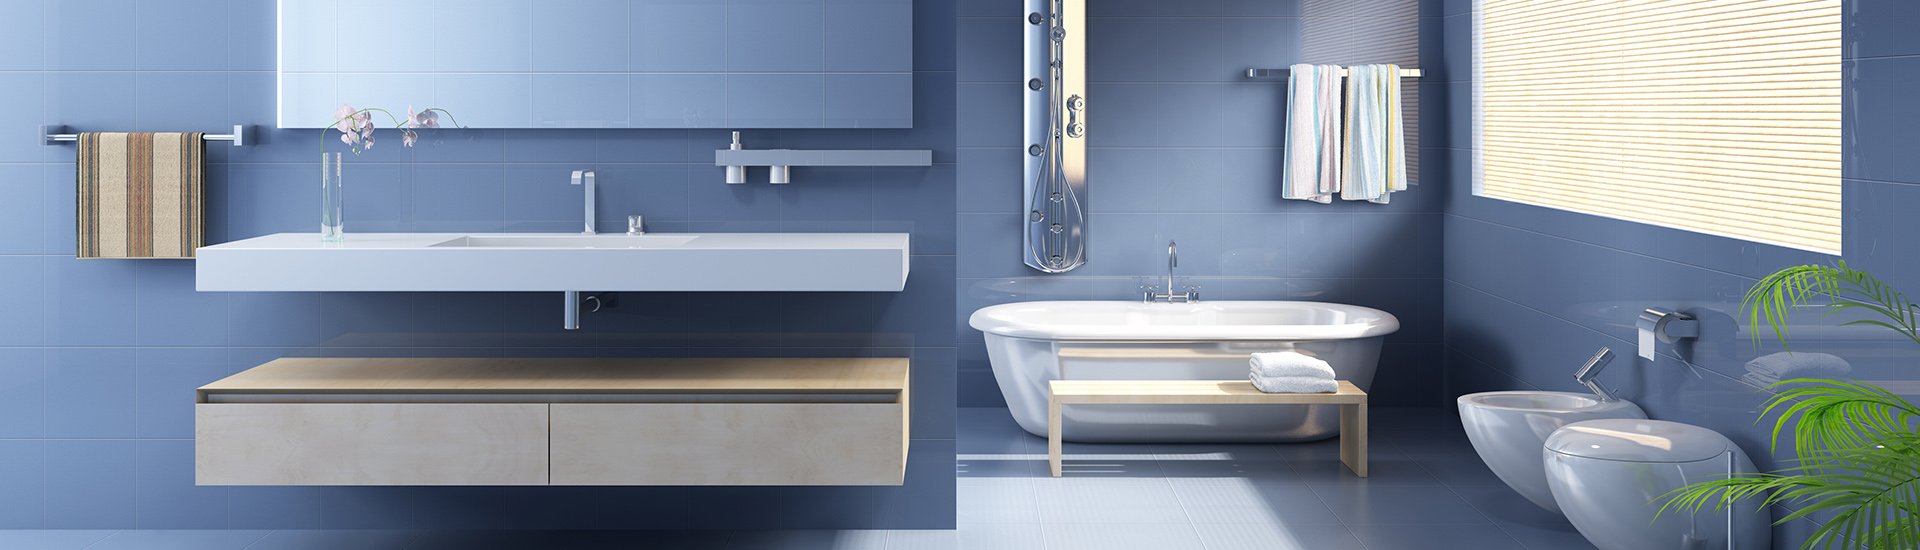 De Ruiter Badkamerbouw | Moderne badkamer 2